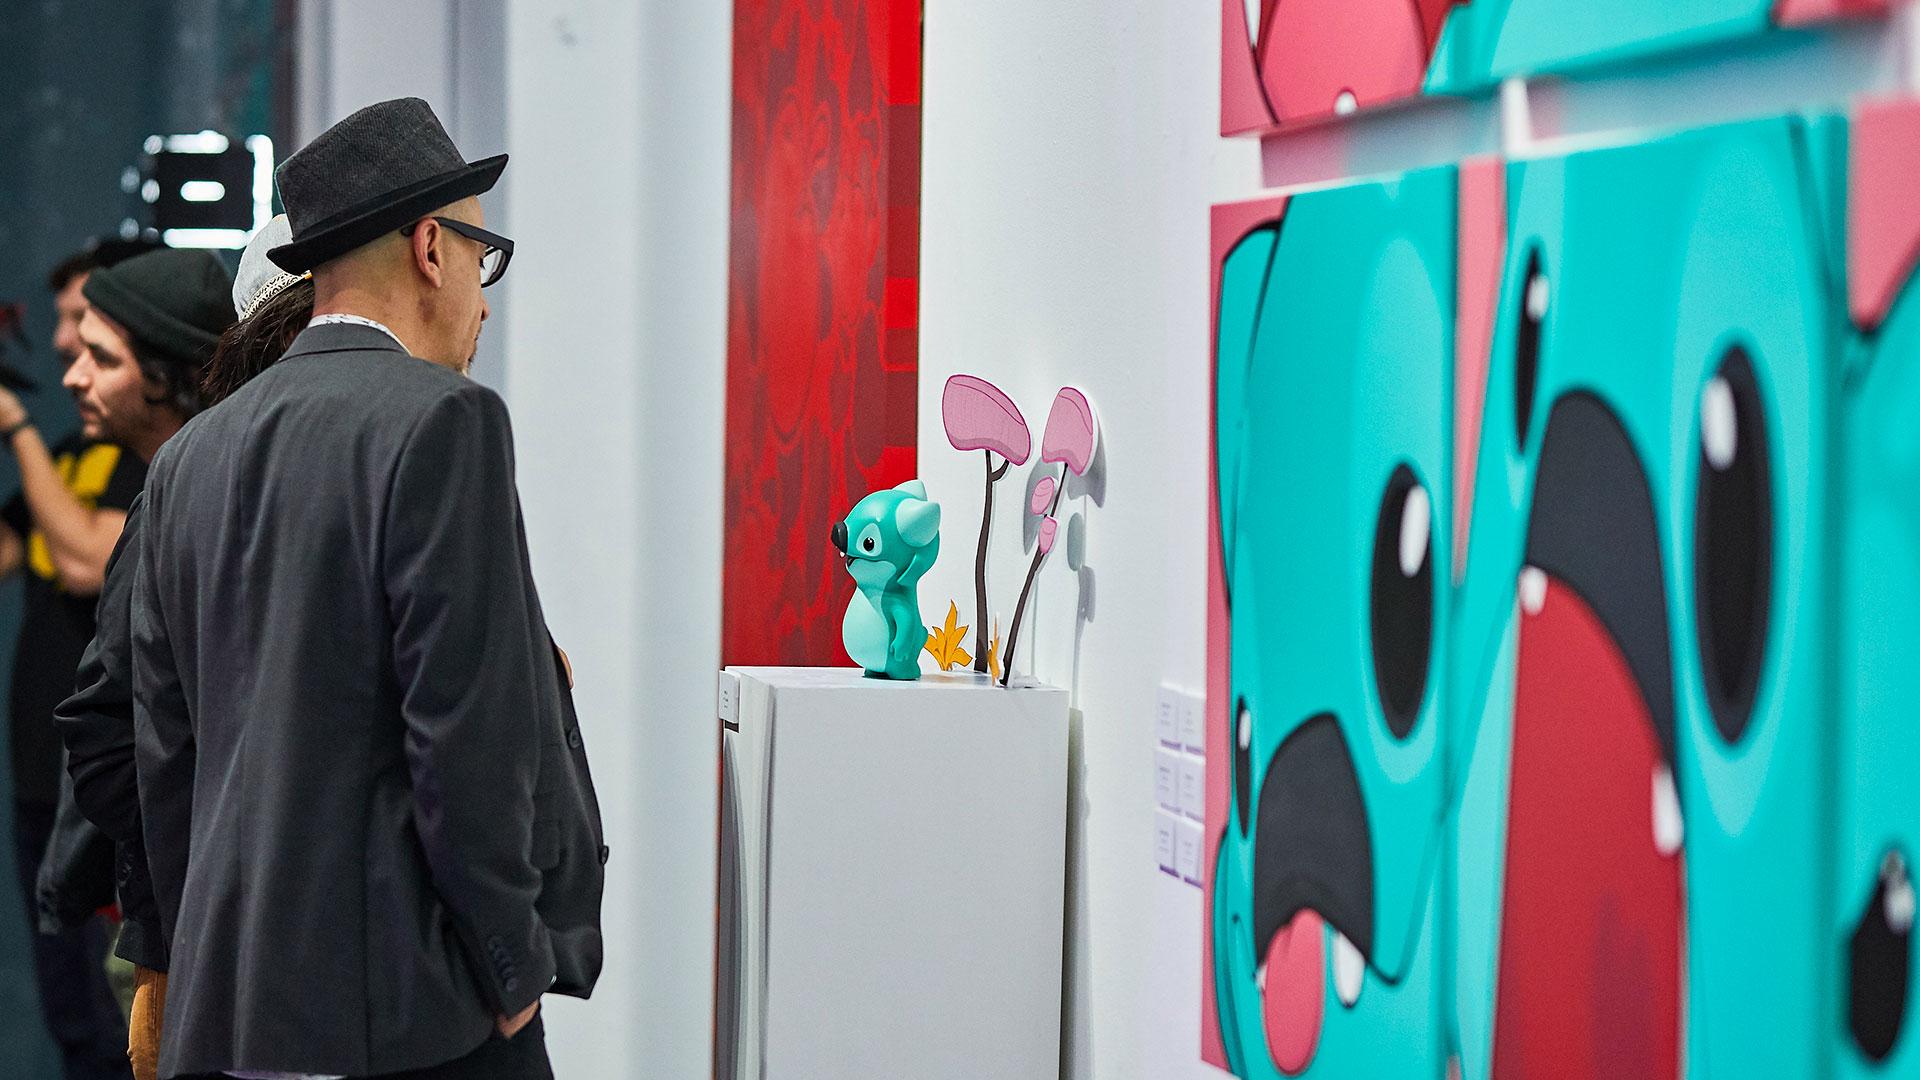 24k_Fern-Ringo-Monsters-Gallery-09b.jpg